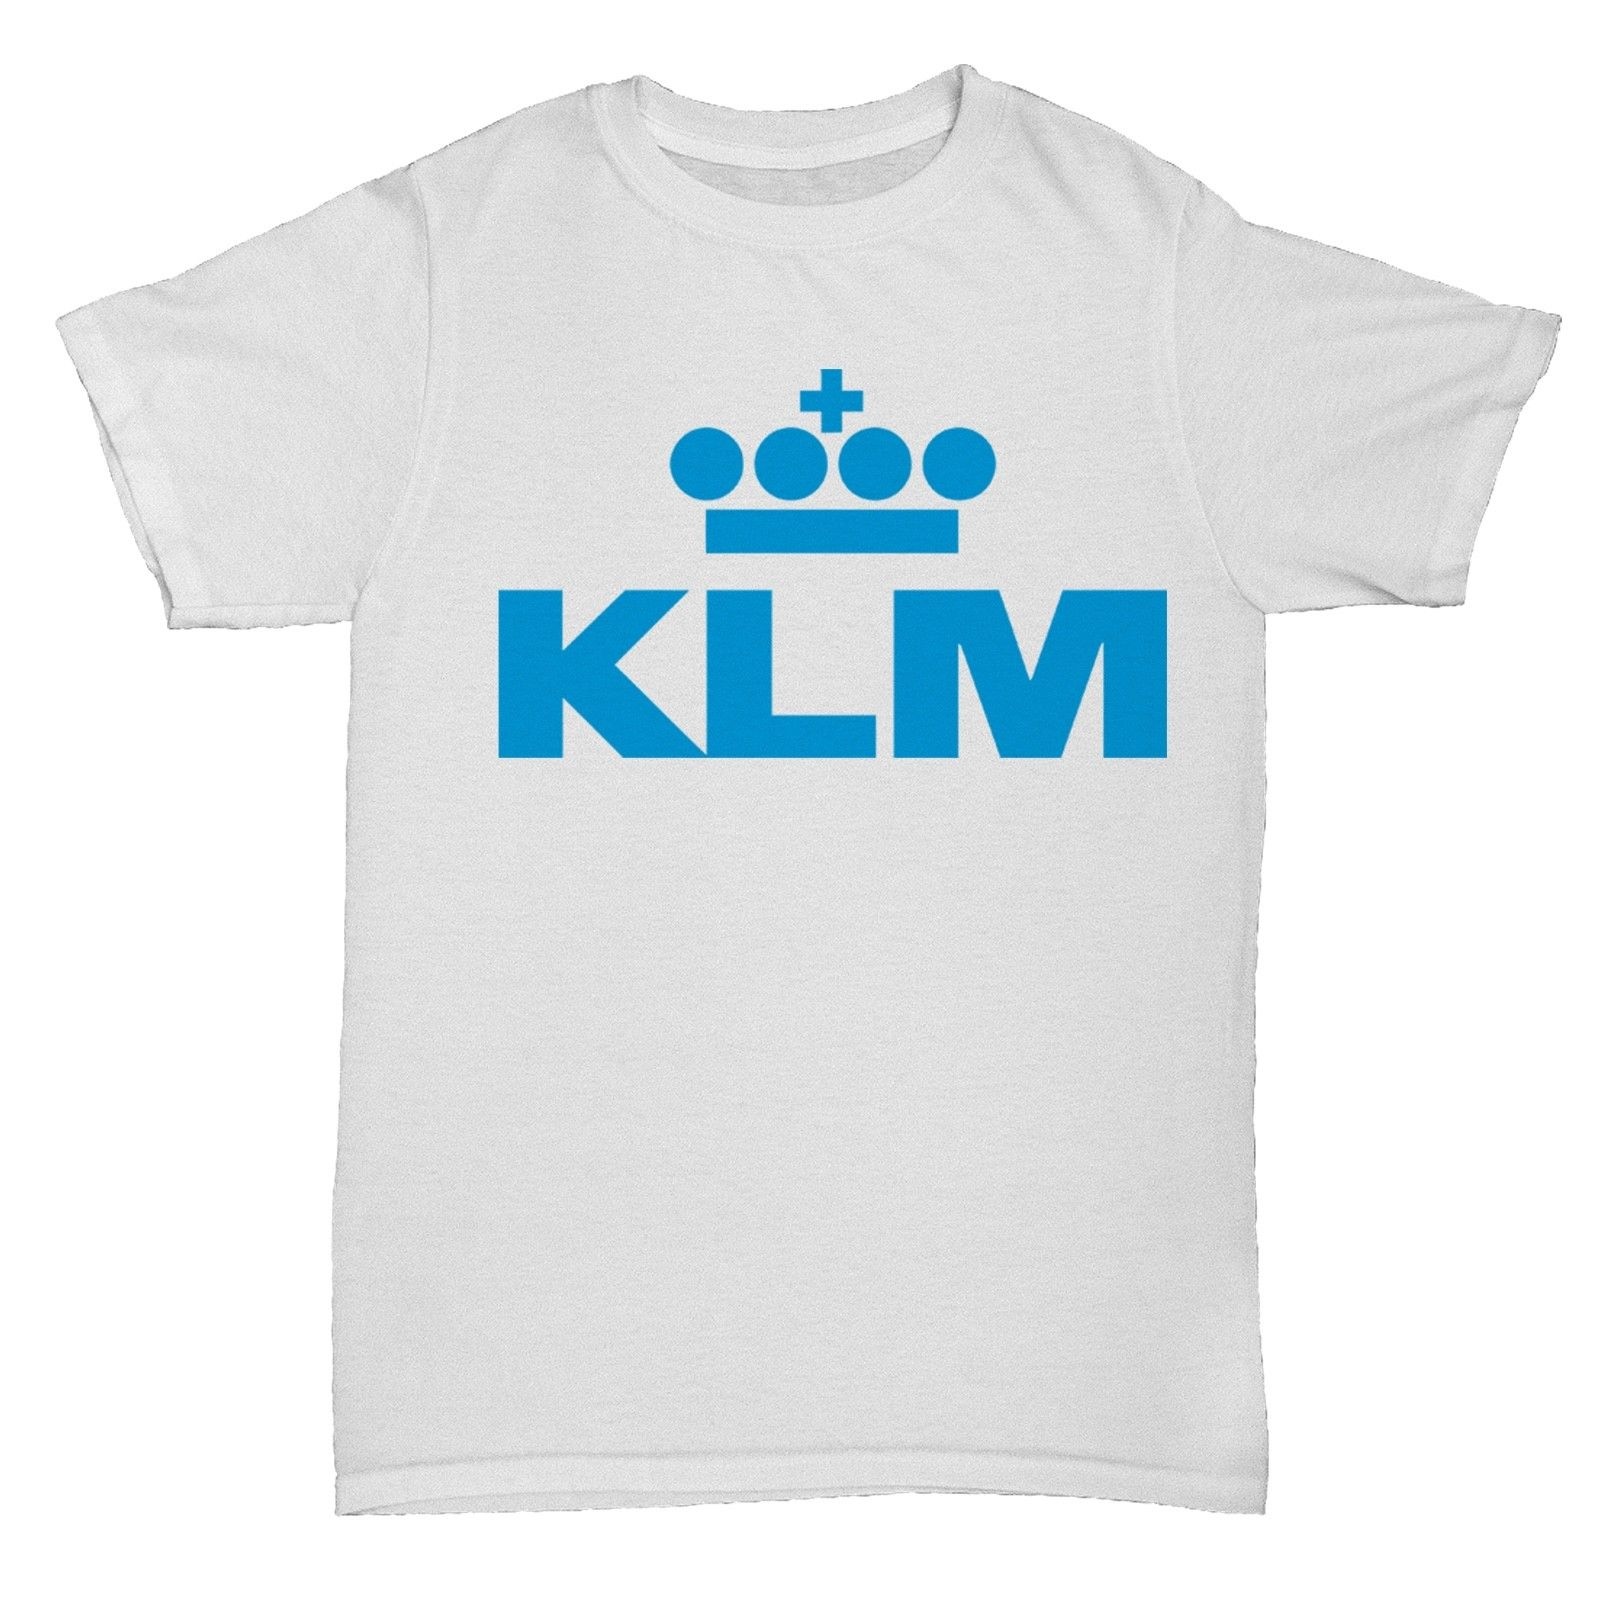 KLM AIRLINES RETRO AEROPLANE BOAC PAN AM T SHIRT Men T-Shirts Men Clothing Plus Size top tee